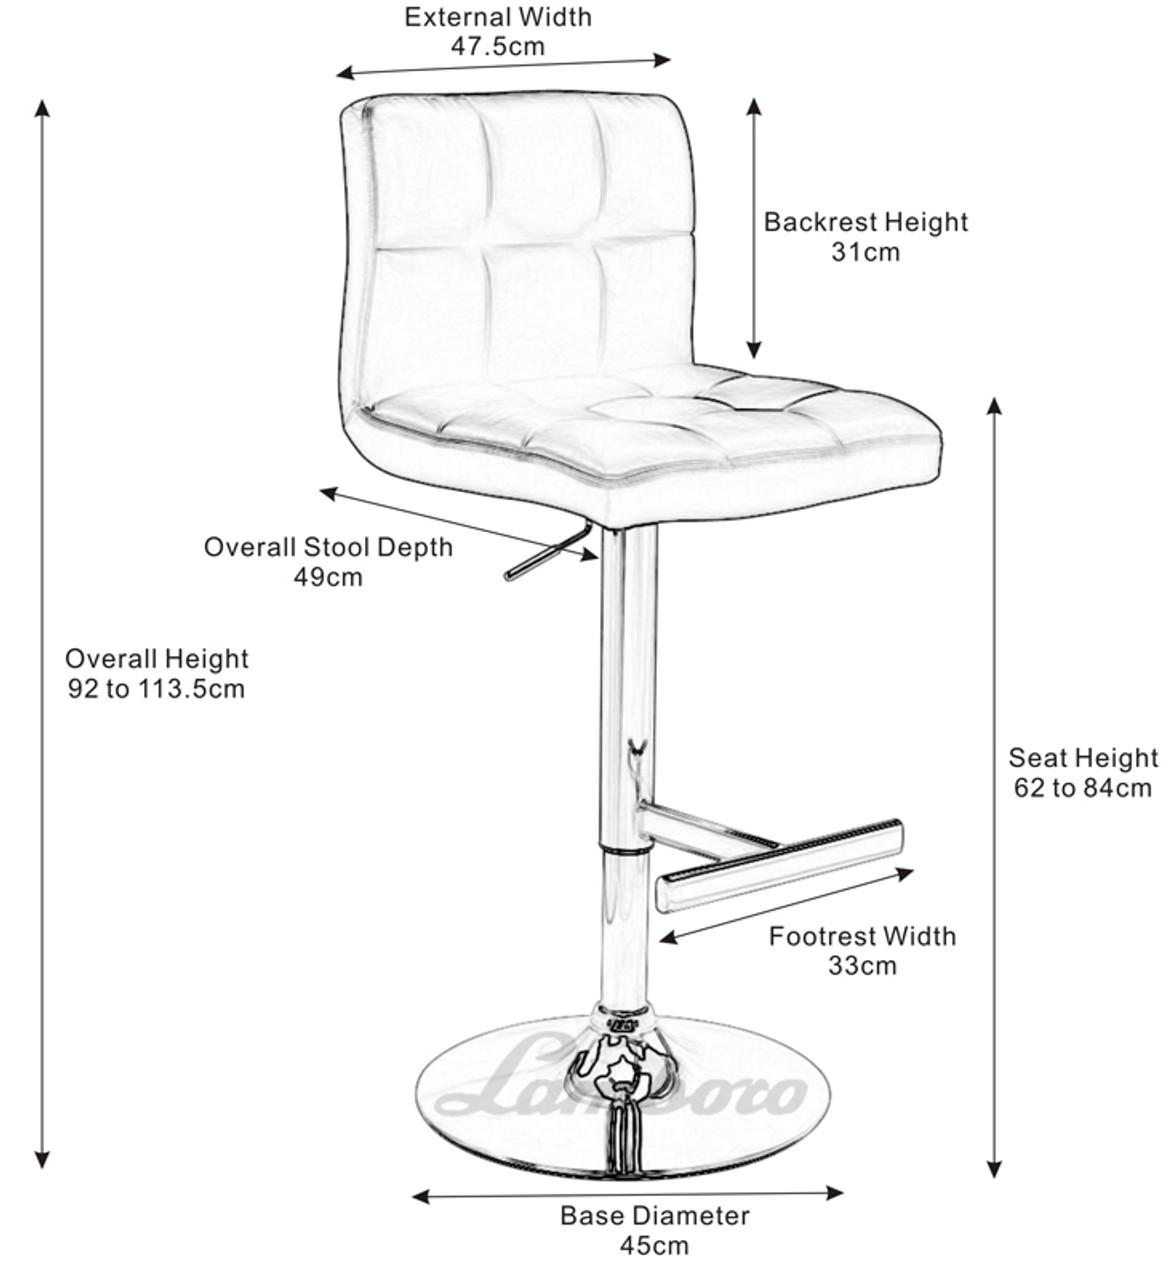 Wondrous Deluxe Allegro Brushed Bar Stool Brown Square Base Evergreenethics Interior Chair Design Evergreenethicsorg